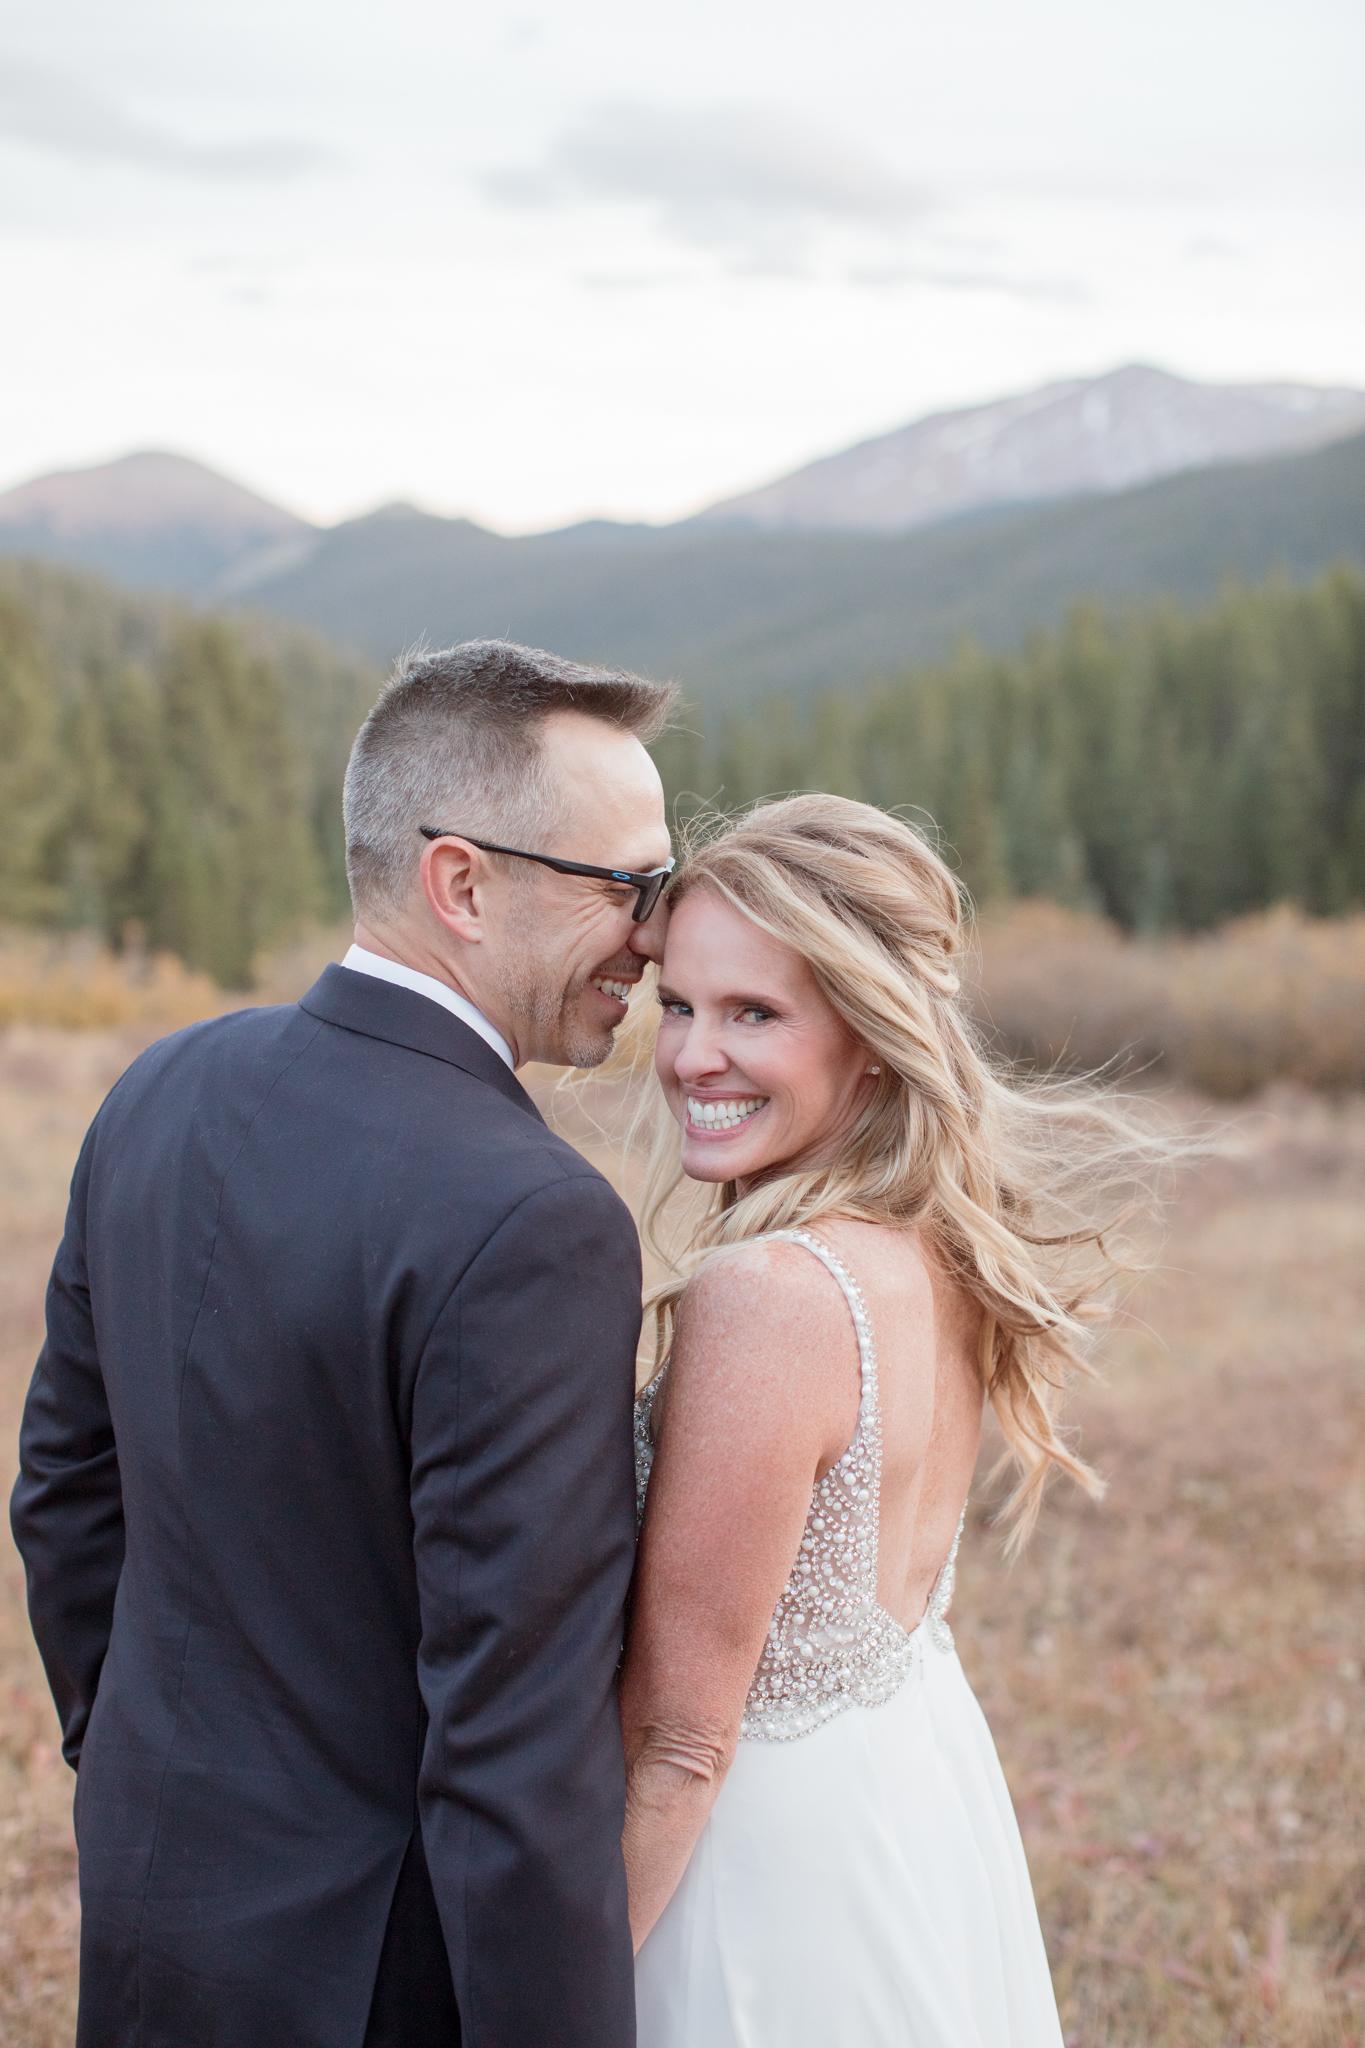 Kelli_and_Tom_Lodge_at_Breckenridge_Wedding_264